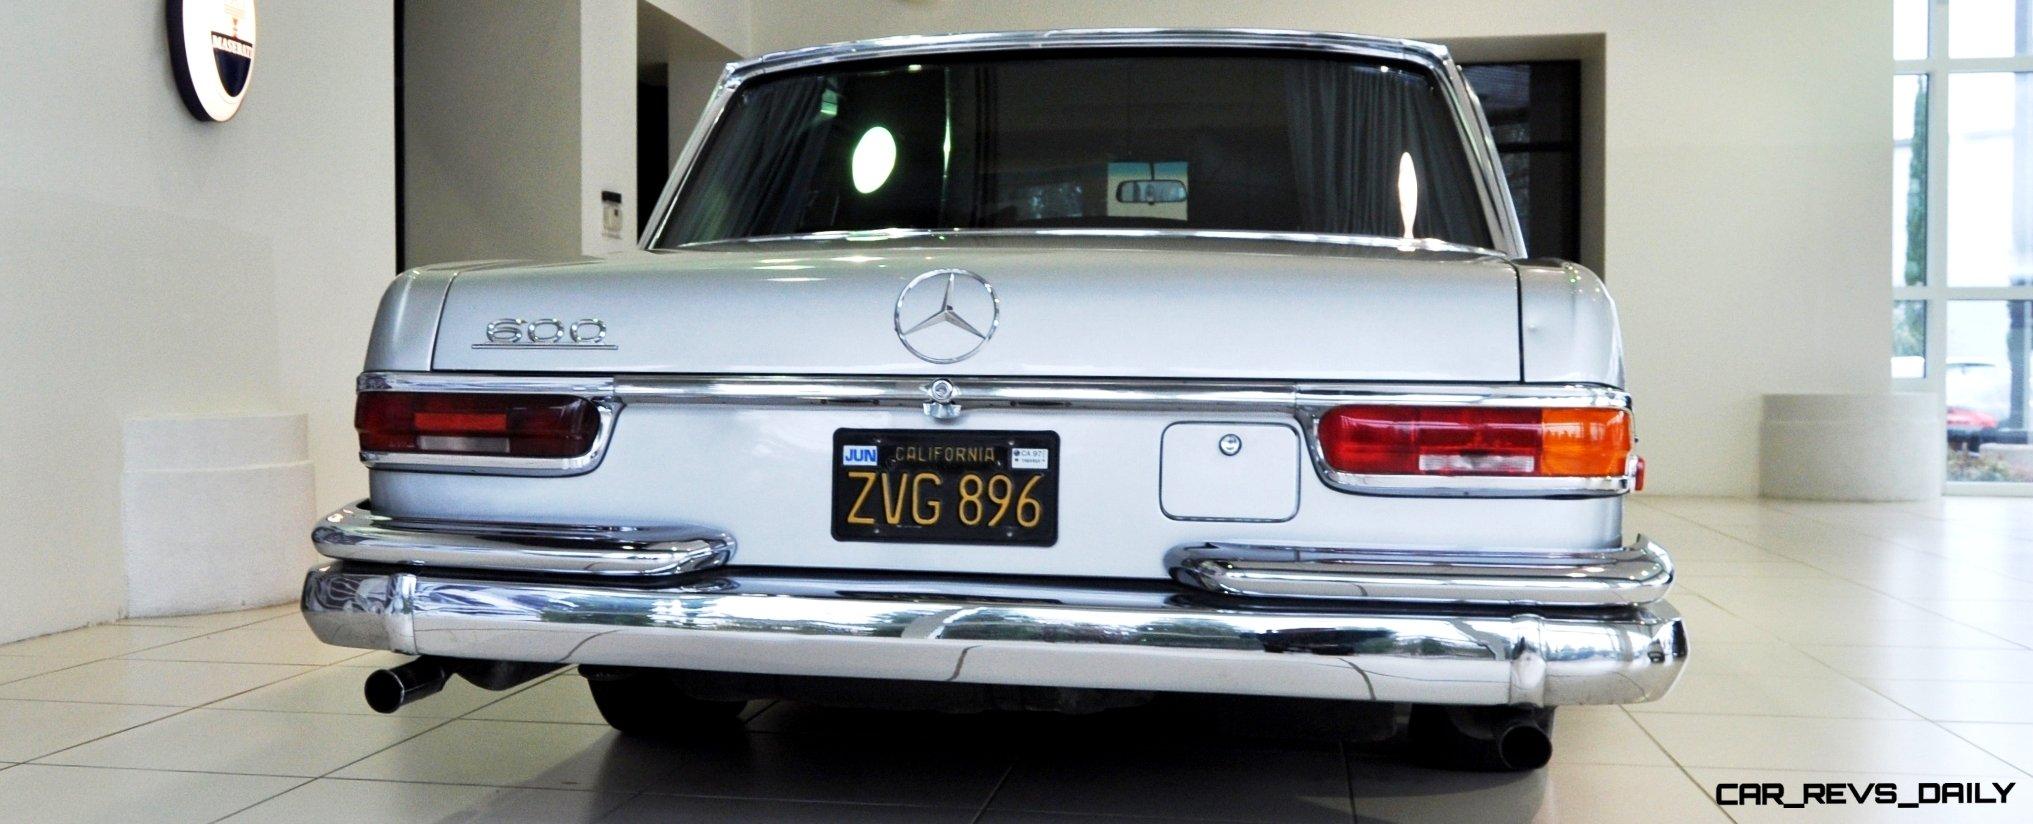 Update1 1970 mercedes benz 600 pullman swb for 75 000 for 1970 mercedes benz